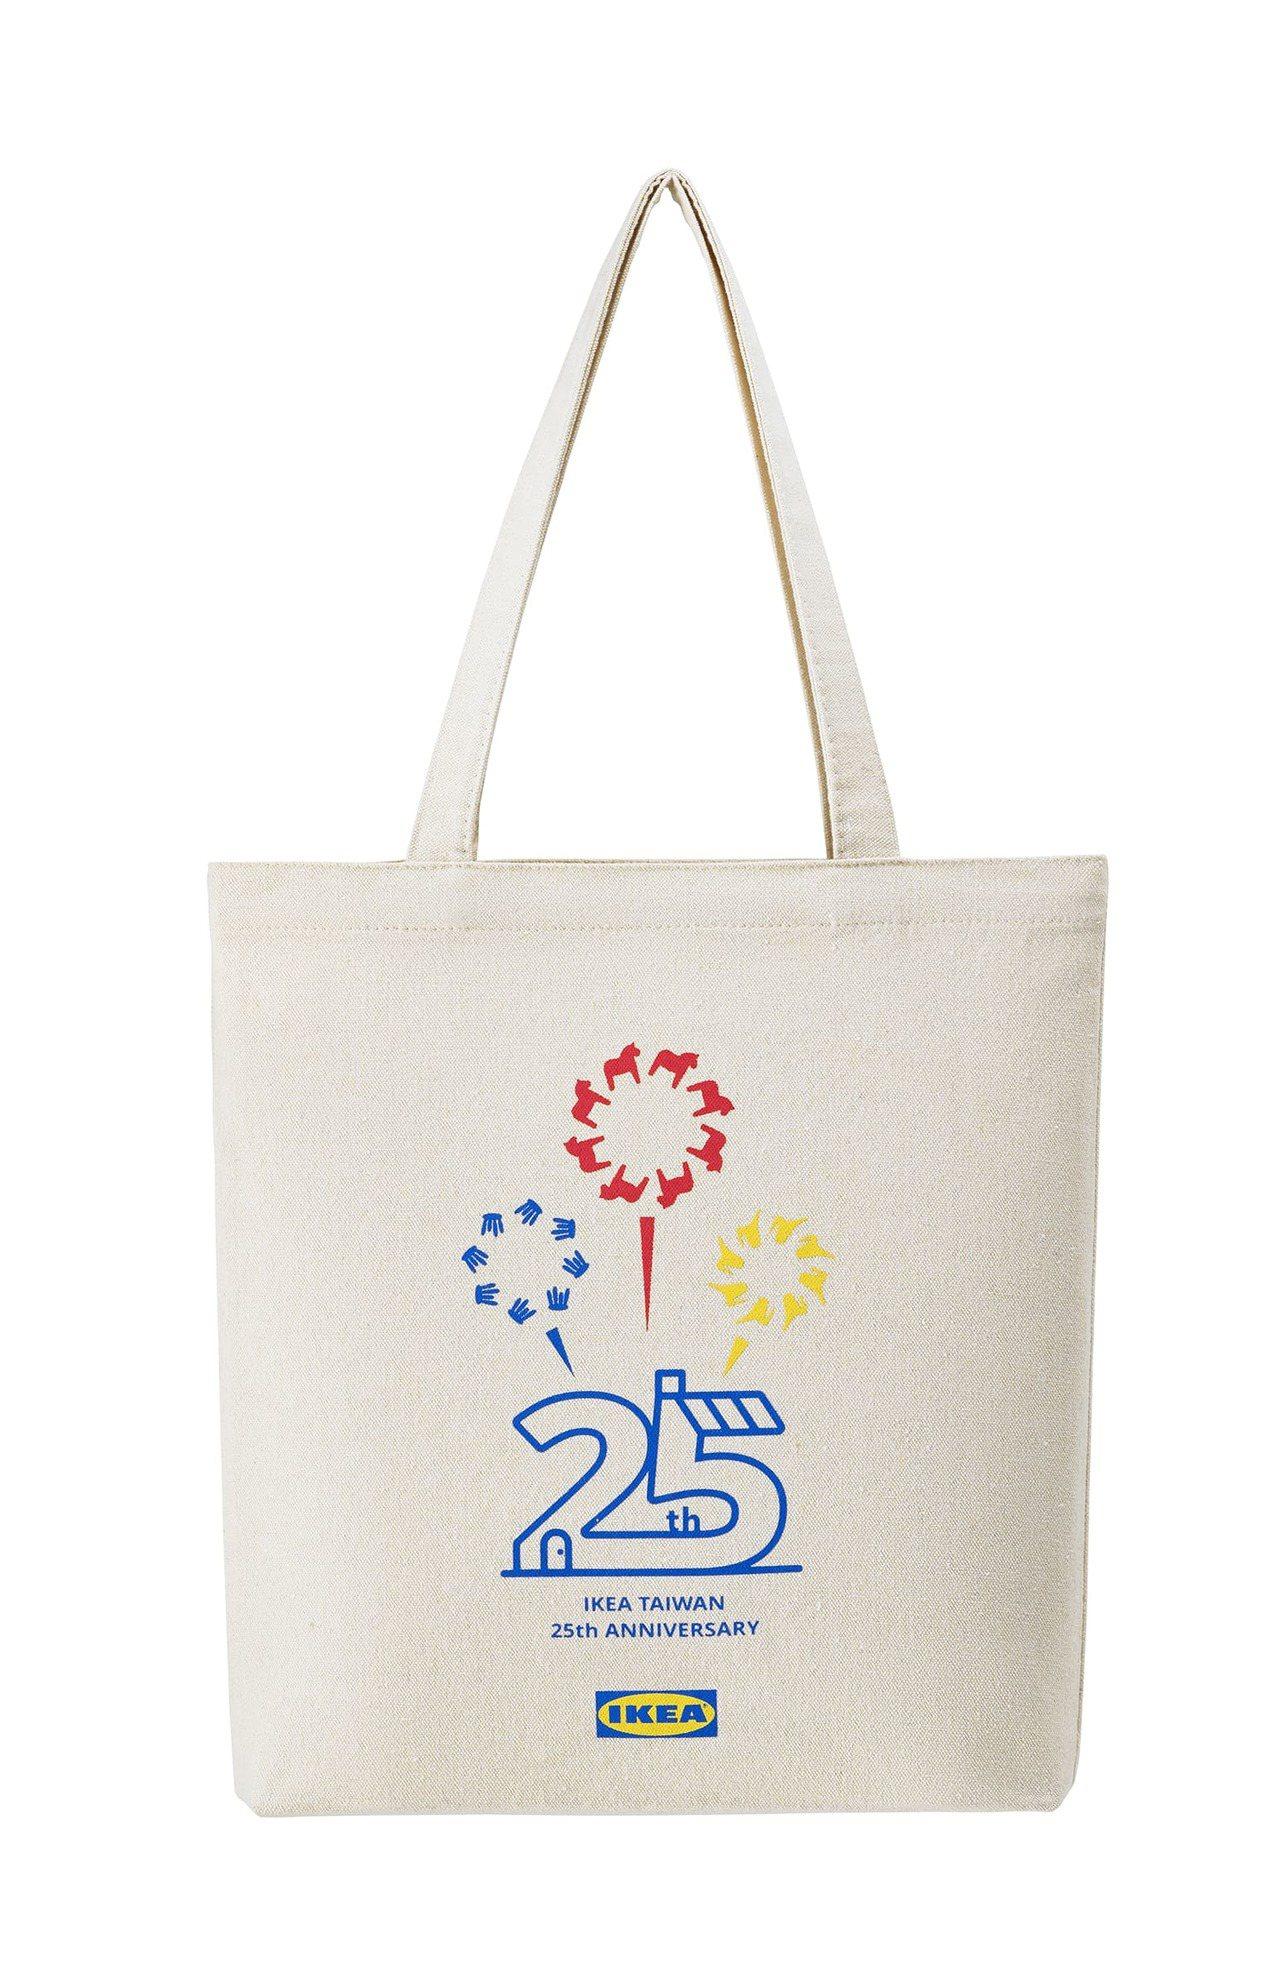 IKEA歡慶來台25周年,10月4日至11月13日持宜家卡消費滿2,500元,即...